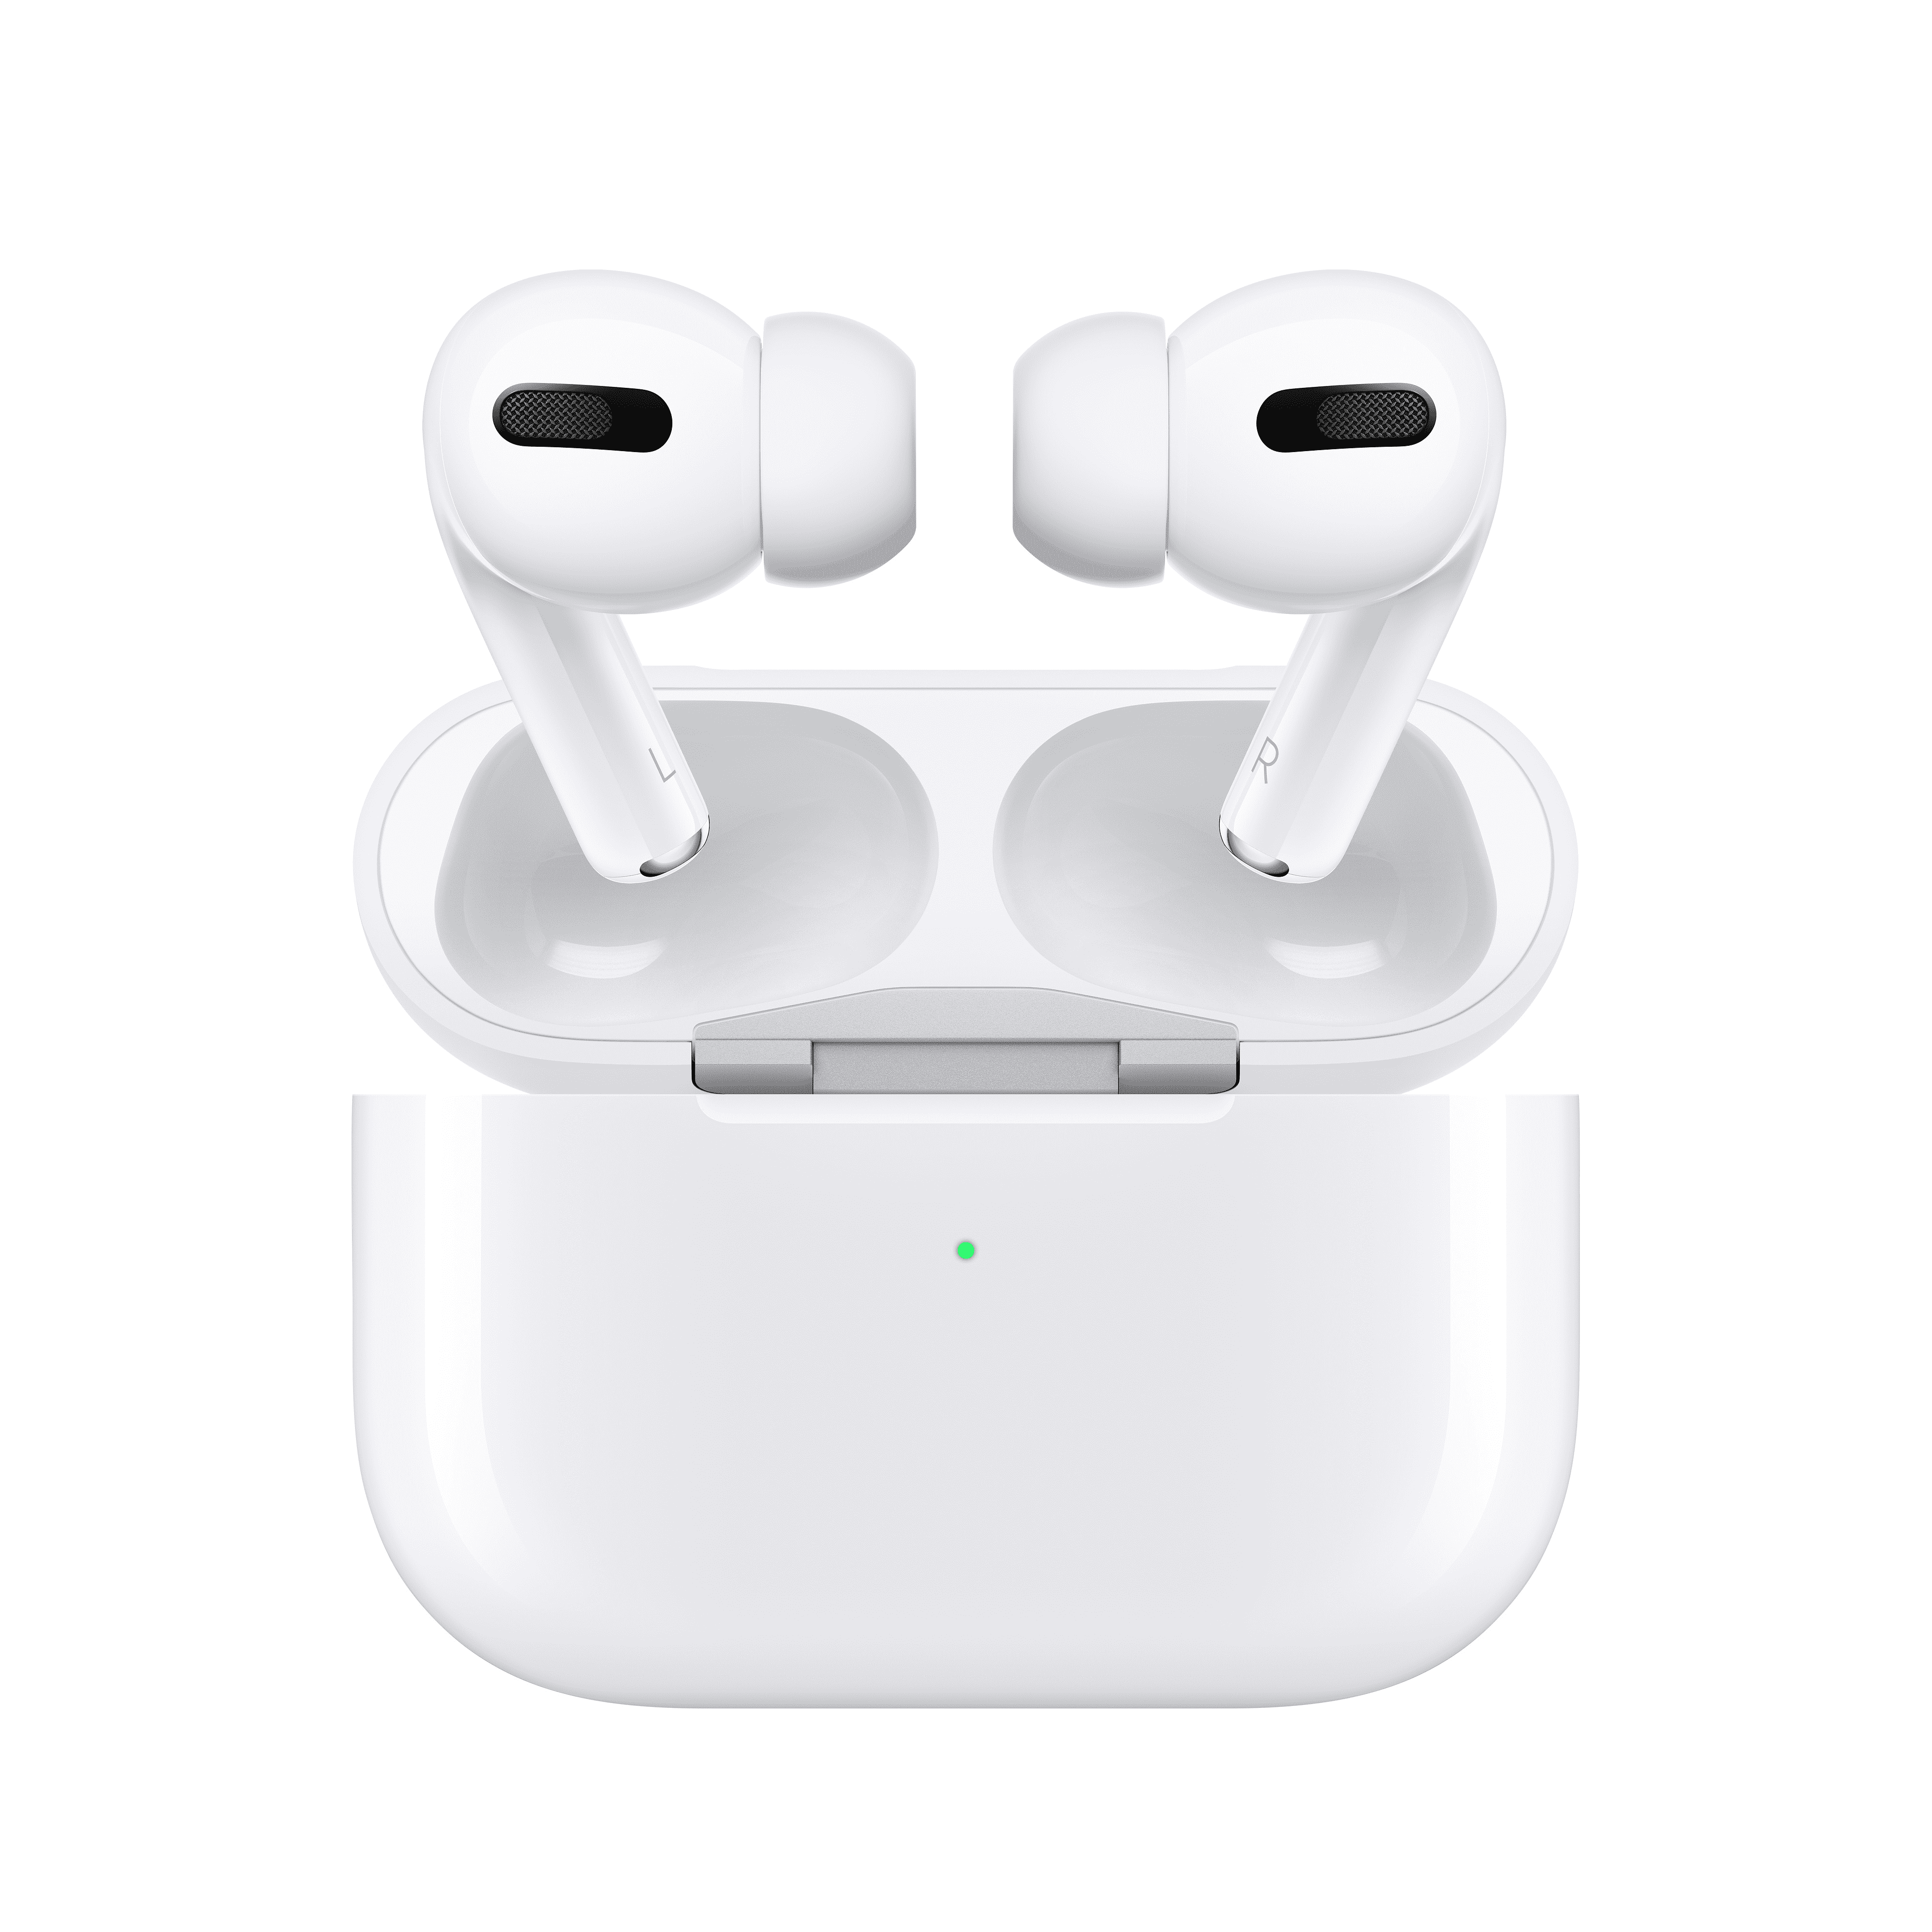 Apple AirPods Pro hoesjes